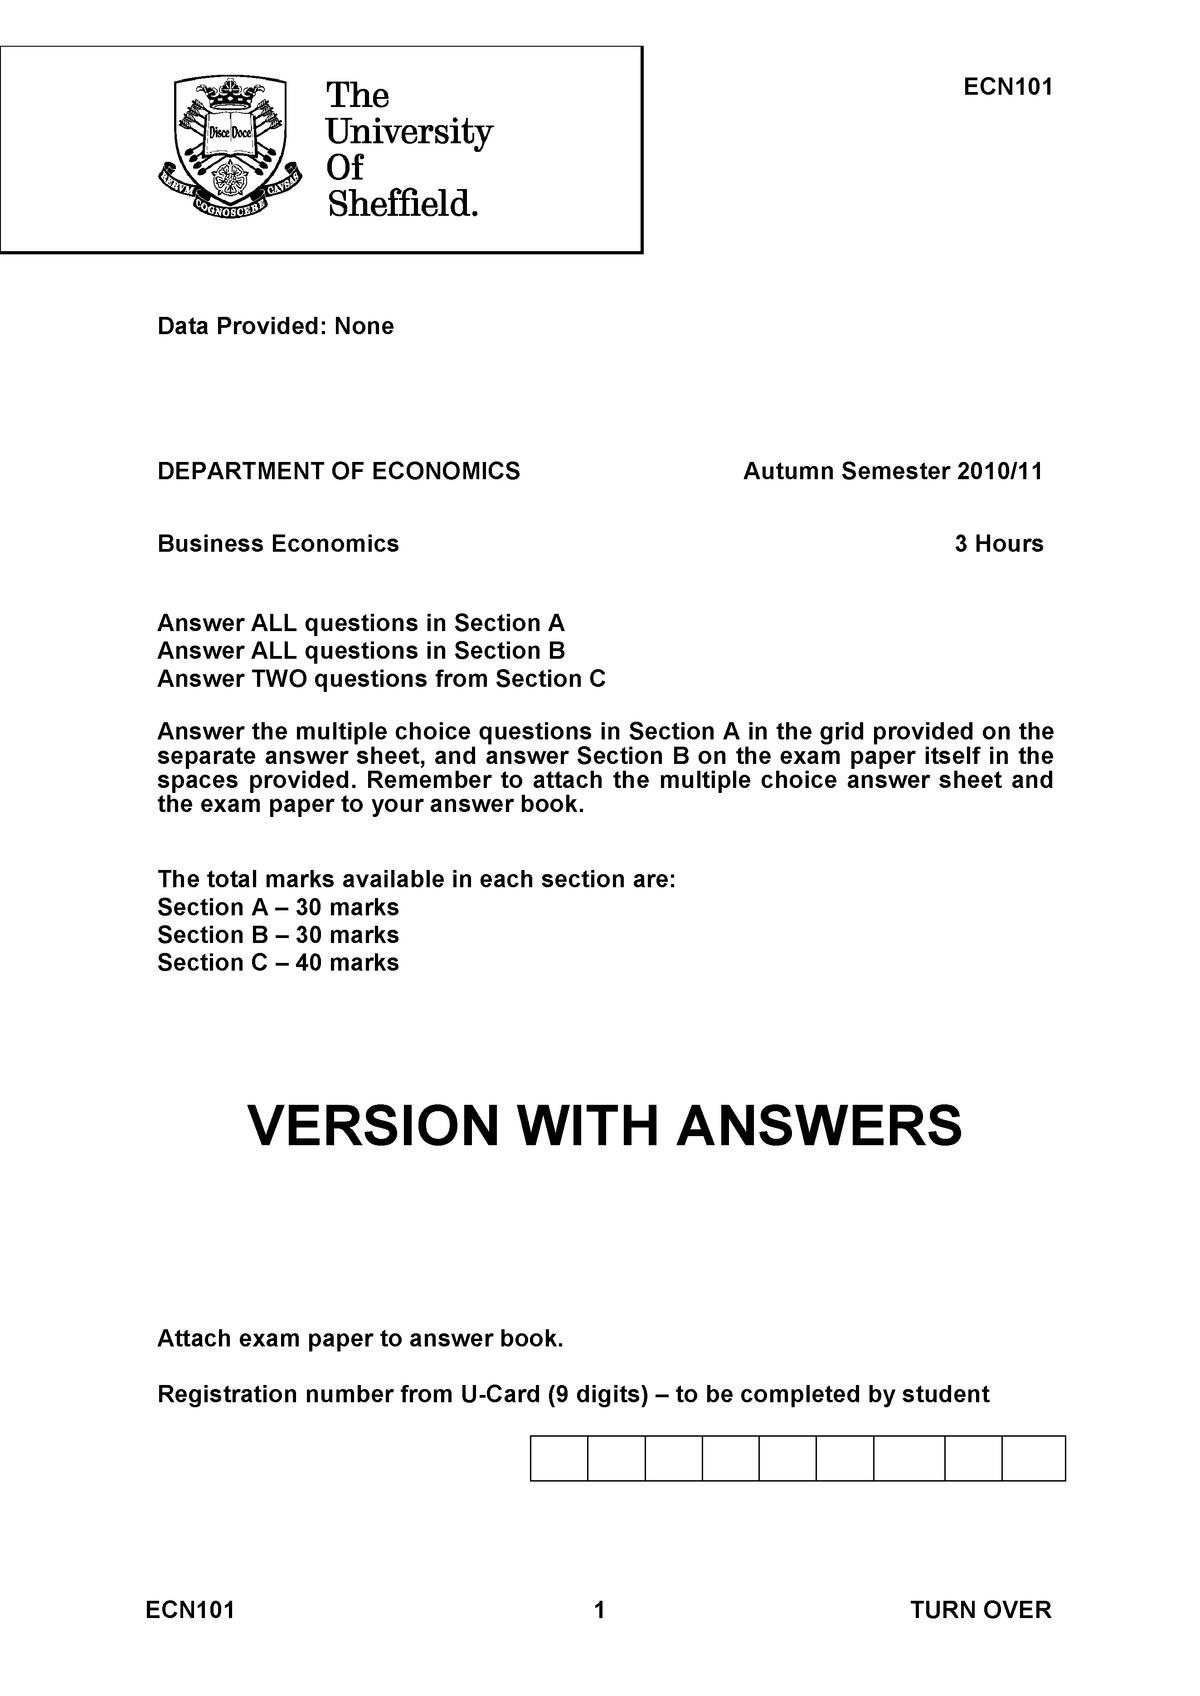 Exam 2010 - ECN101: Business Economics - StuDocu